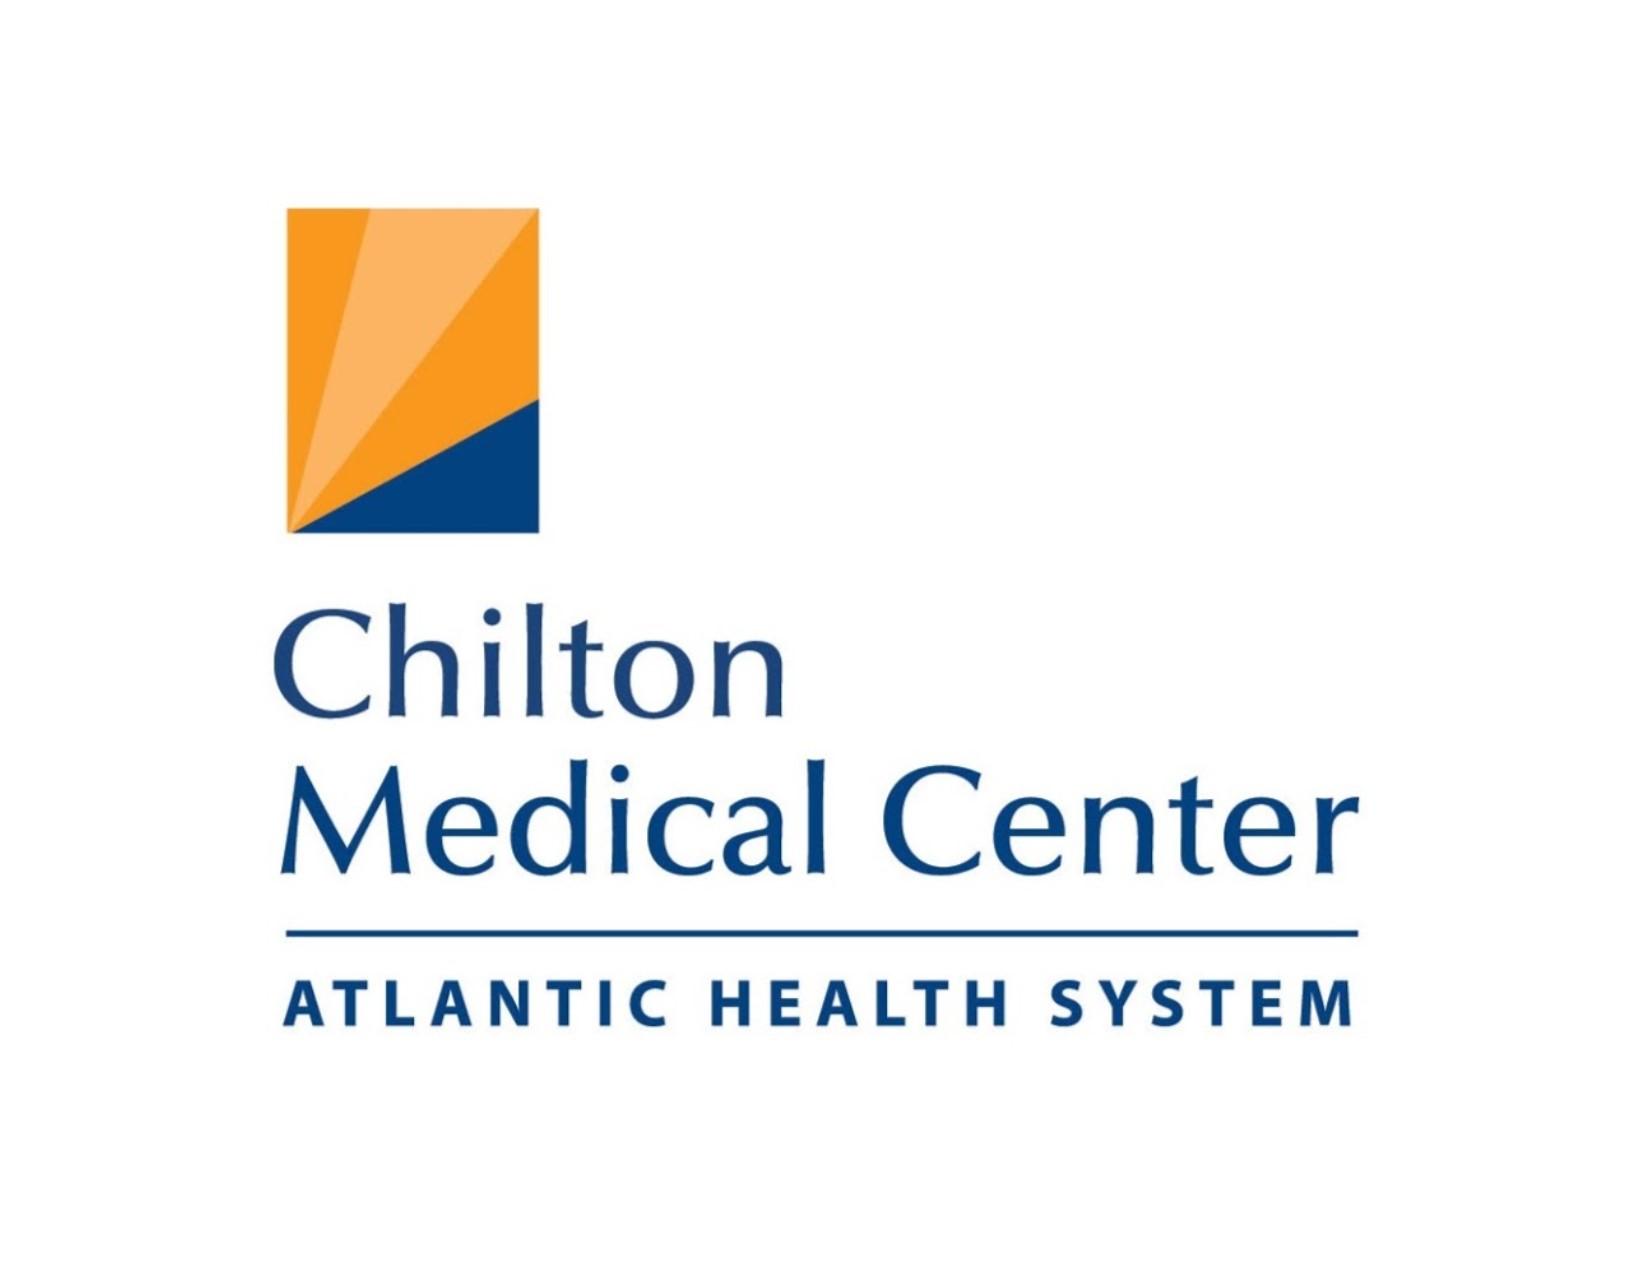 Chilton Medical Center